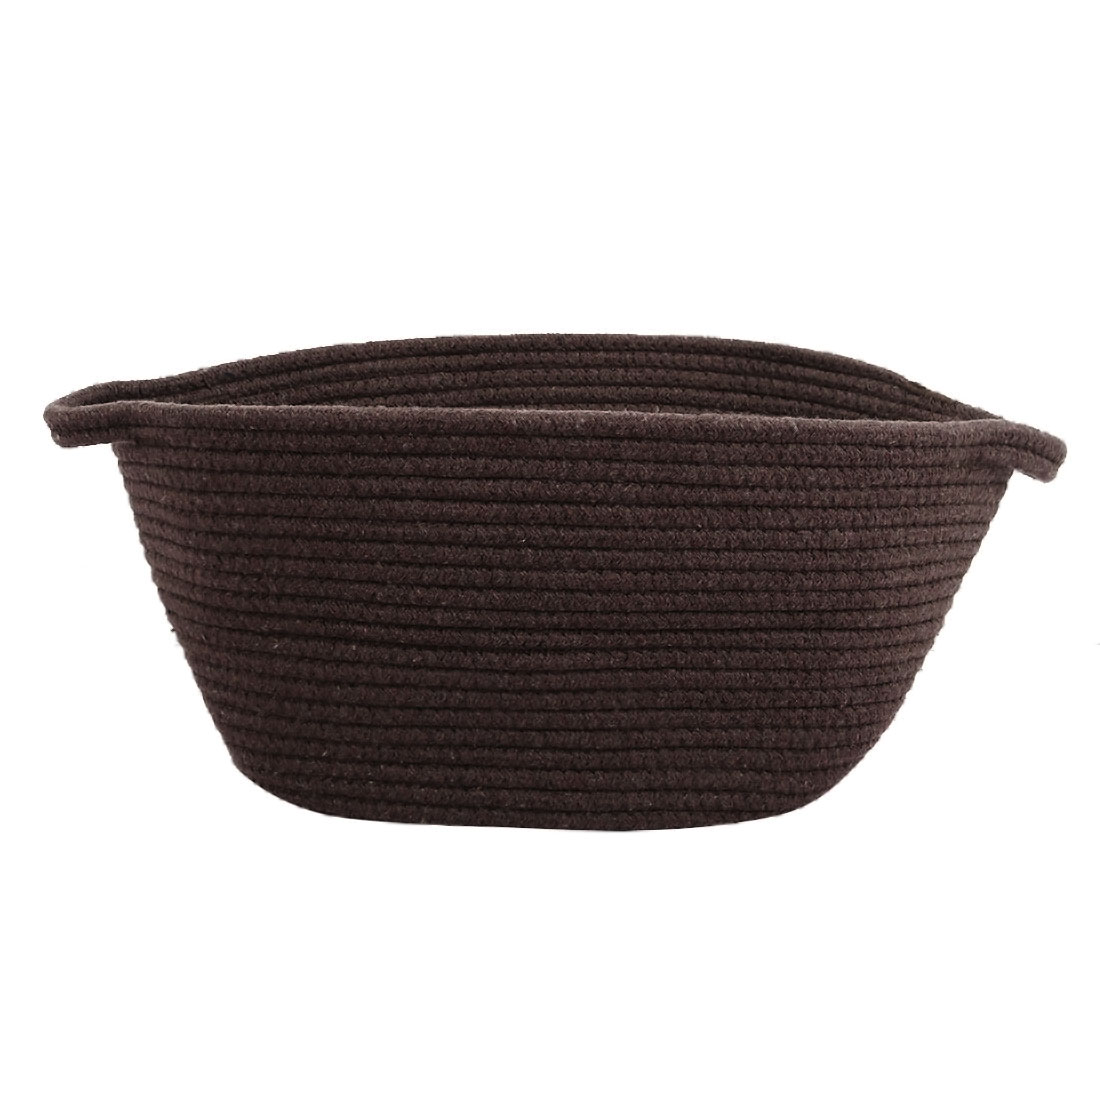 Foldable Storage Bin Closet Box Cotton Rope Baskets (Coffee Color,Oval)